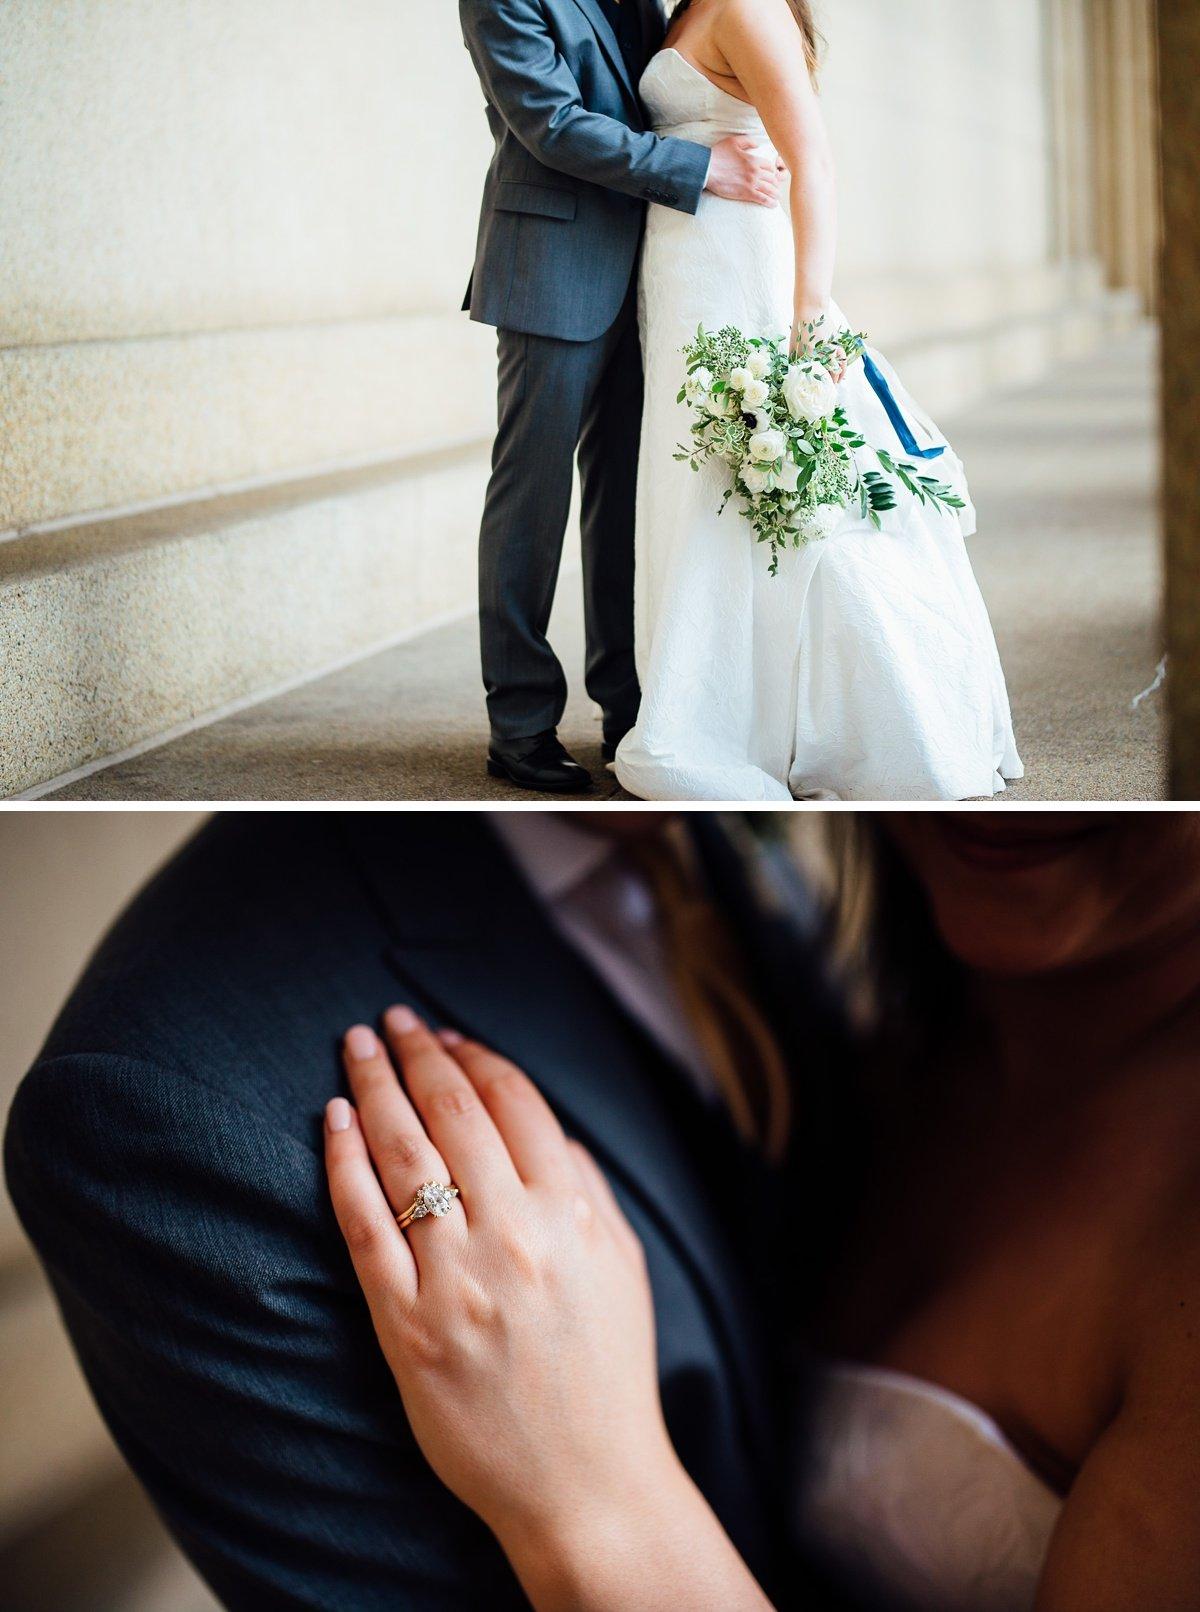 intimate-wedding-details Christ The King Wedding | Loveless Barn | Nina + Evan